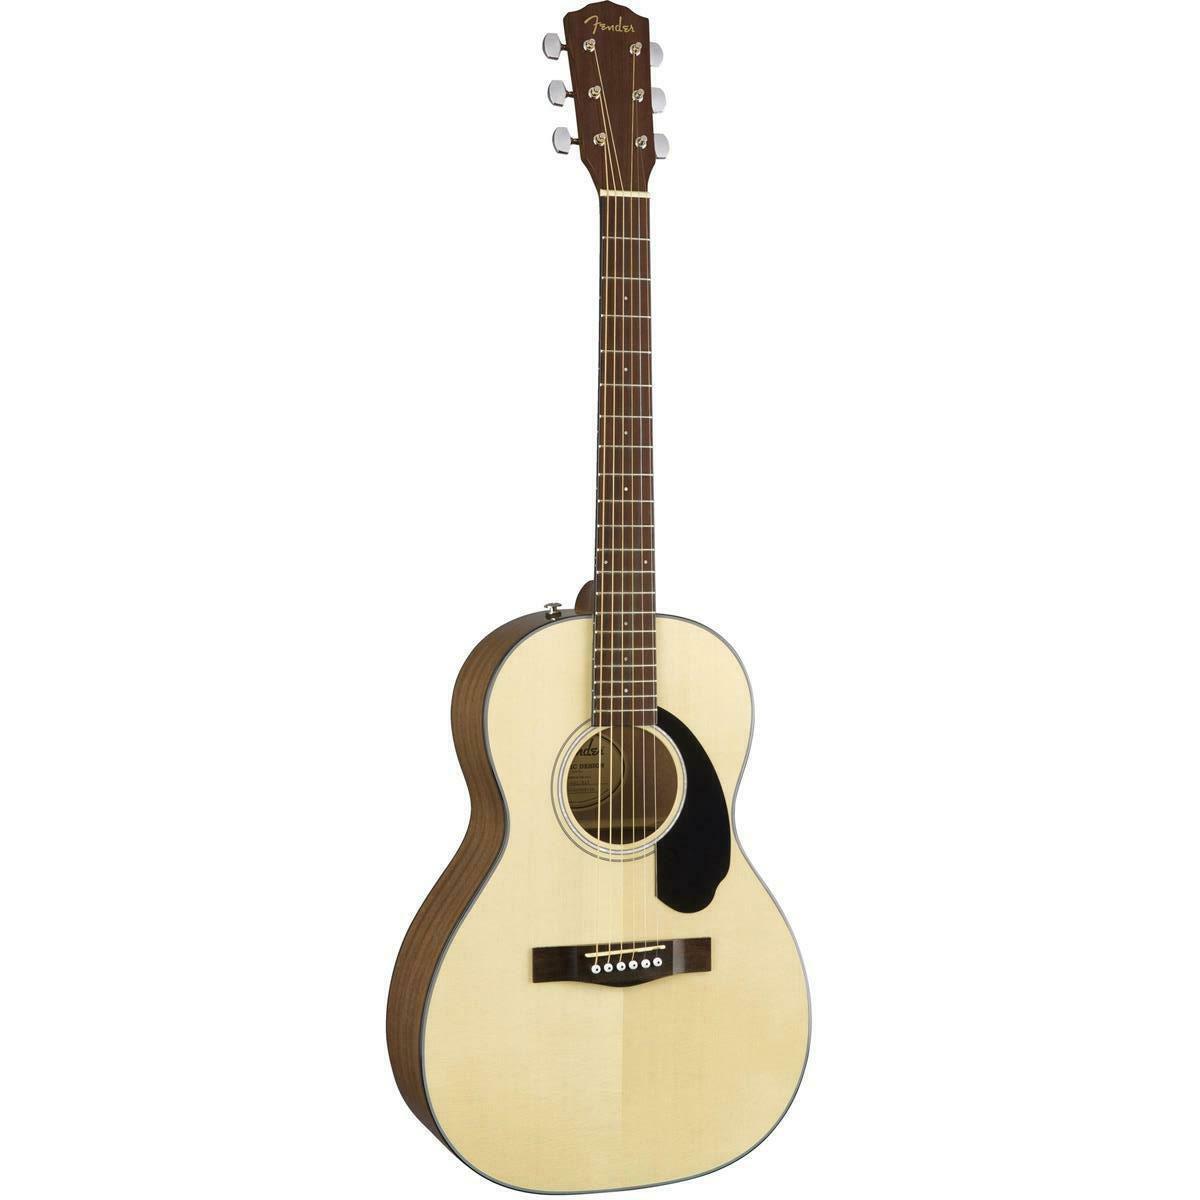 Fender - CP-60S parlor guitare folk naturelle